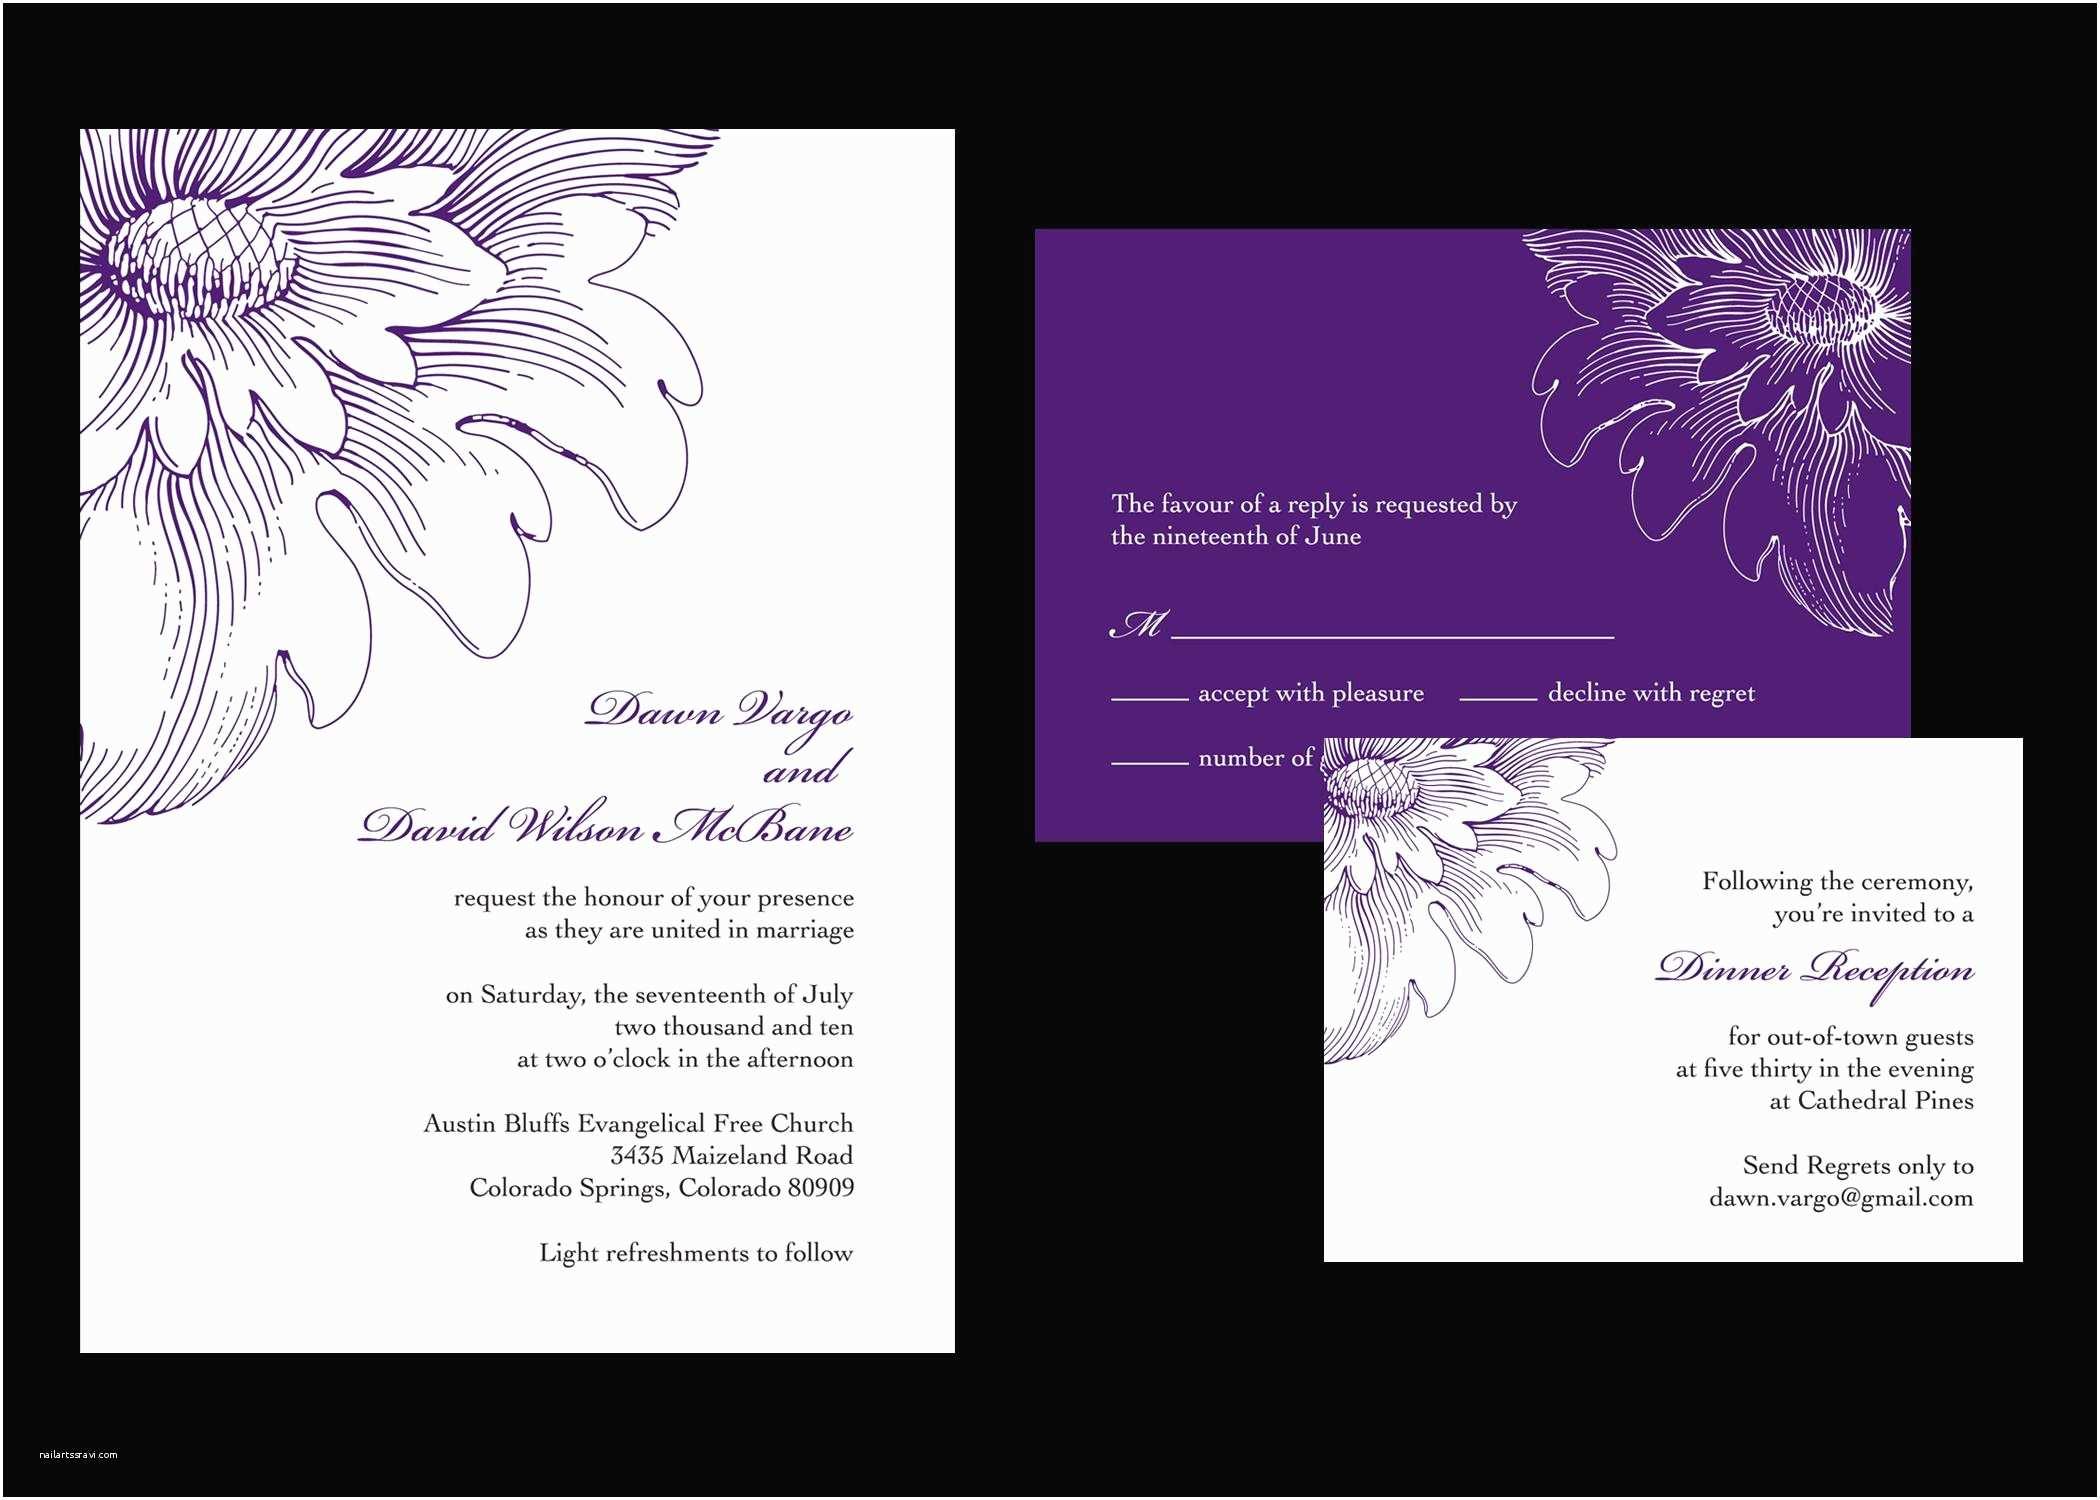 Emily Post Wedding Invitation Wording Emily Post Wedding Invitation Wording Samples Yaseen for